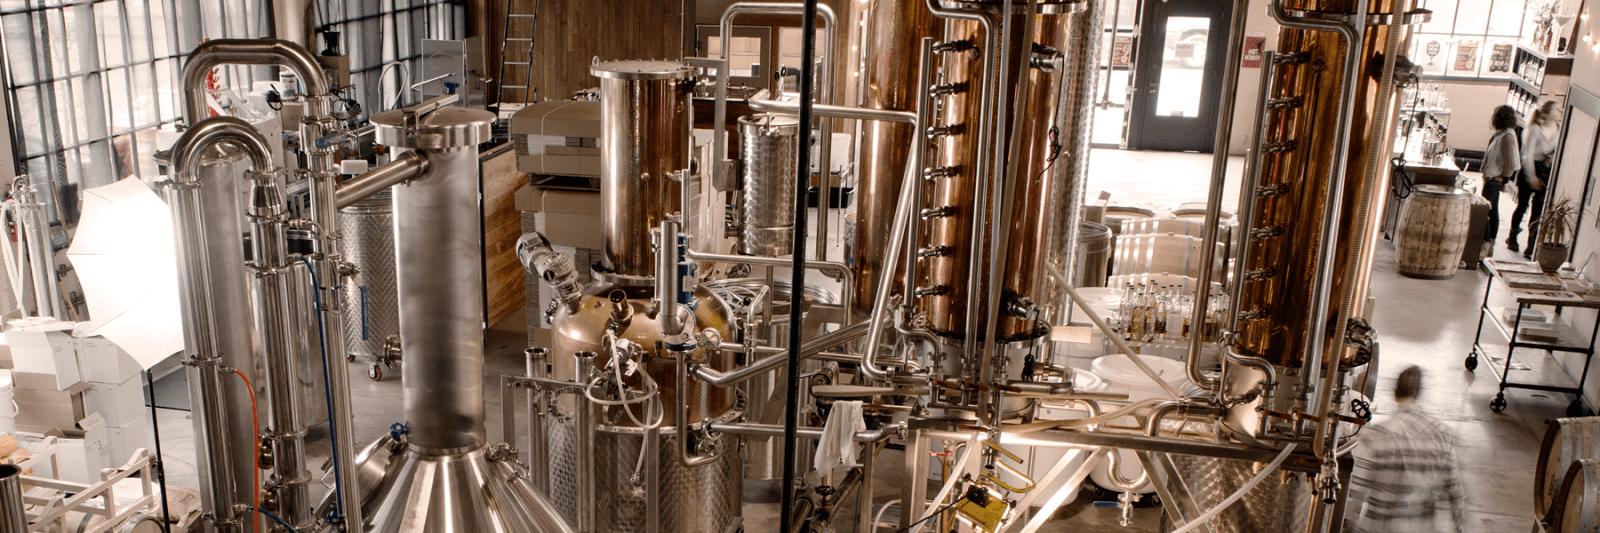 new_deal_distillery_overhead-1600x533-compressor